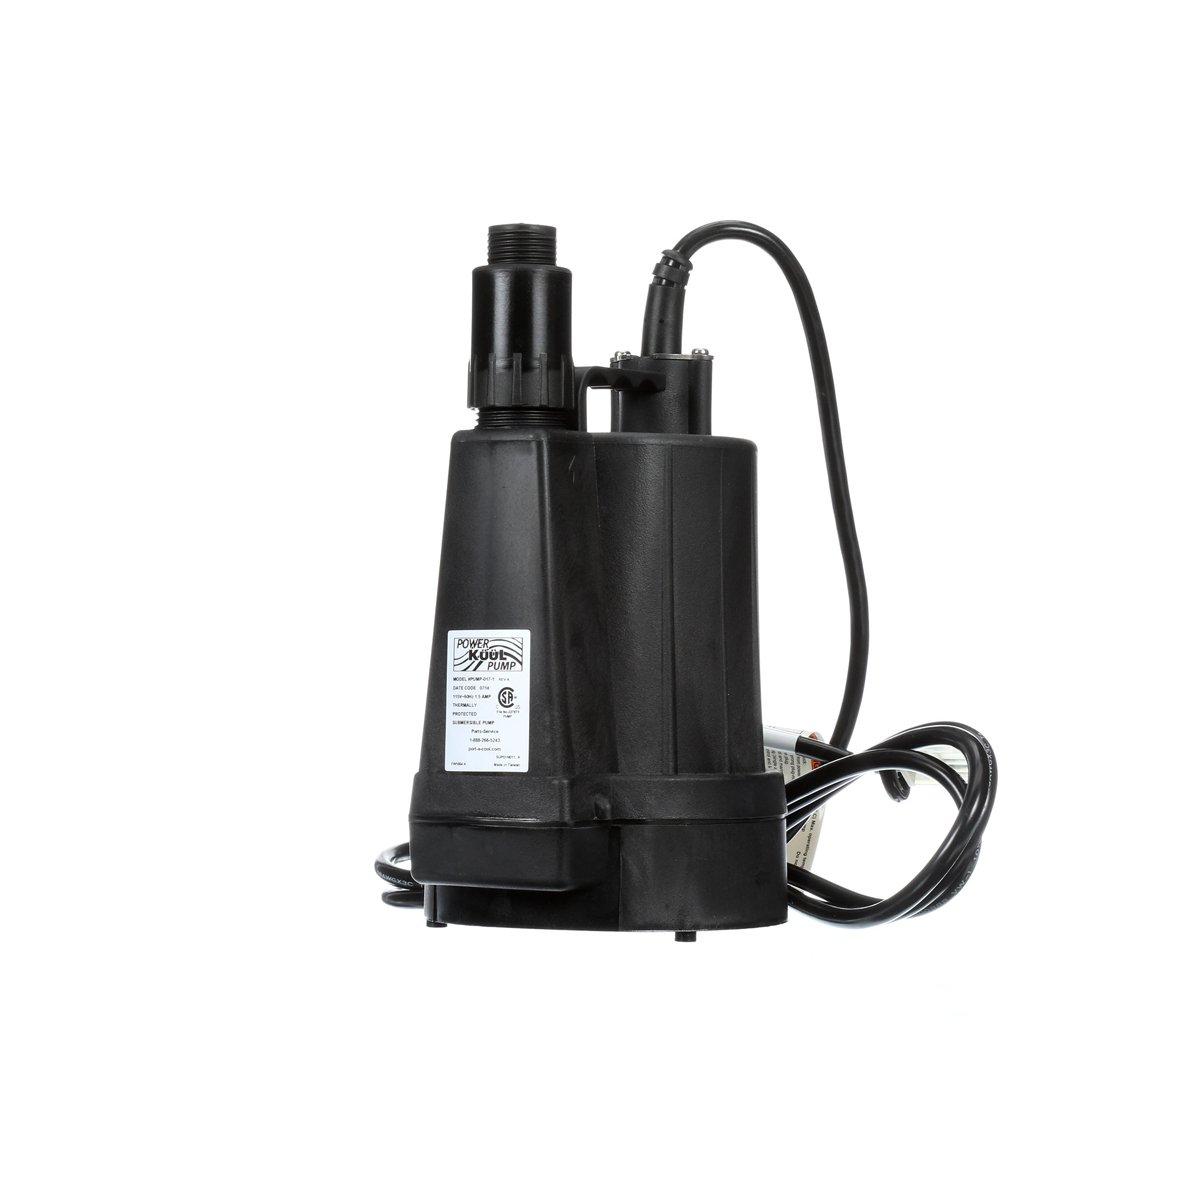 Portacool PACJS2501A1 Jetstream 250 Portable Evaporative Cooler